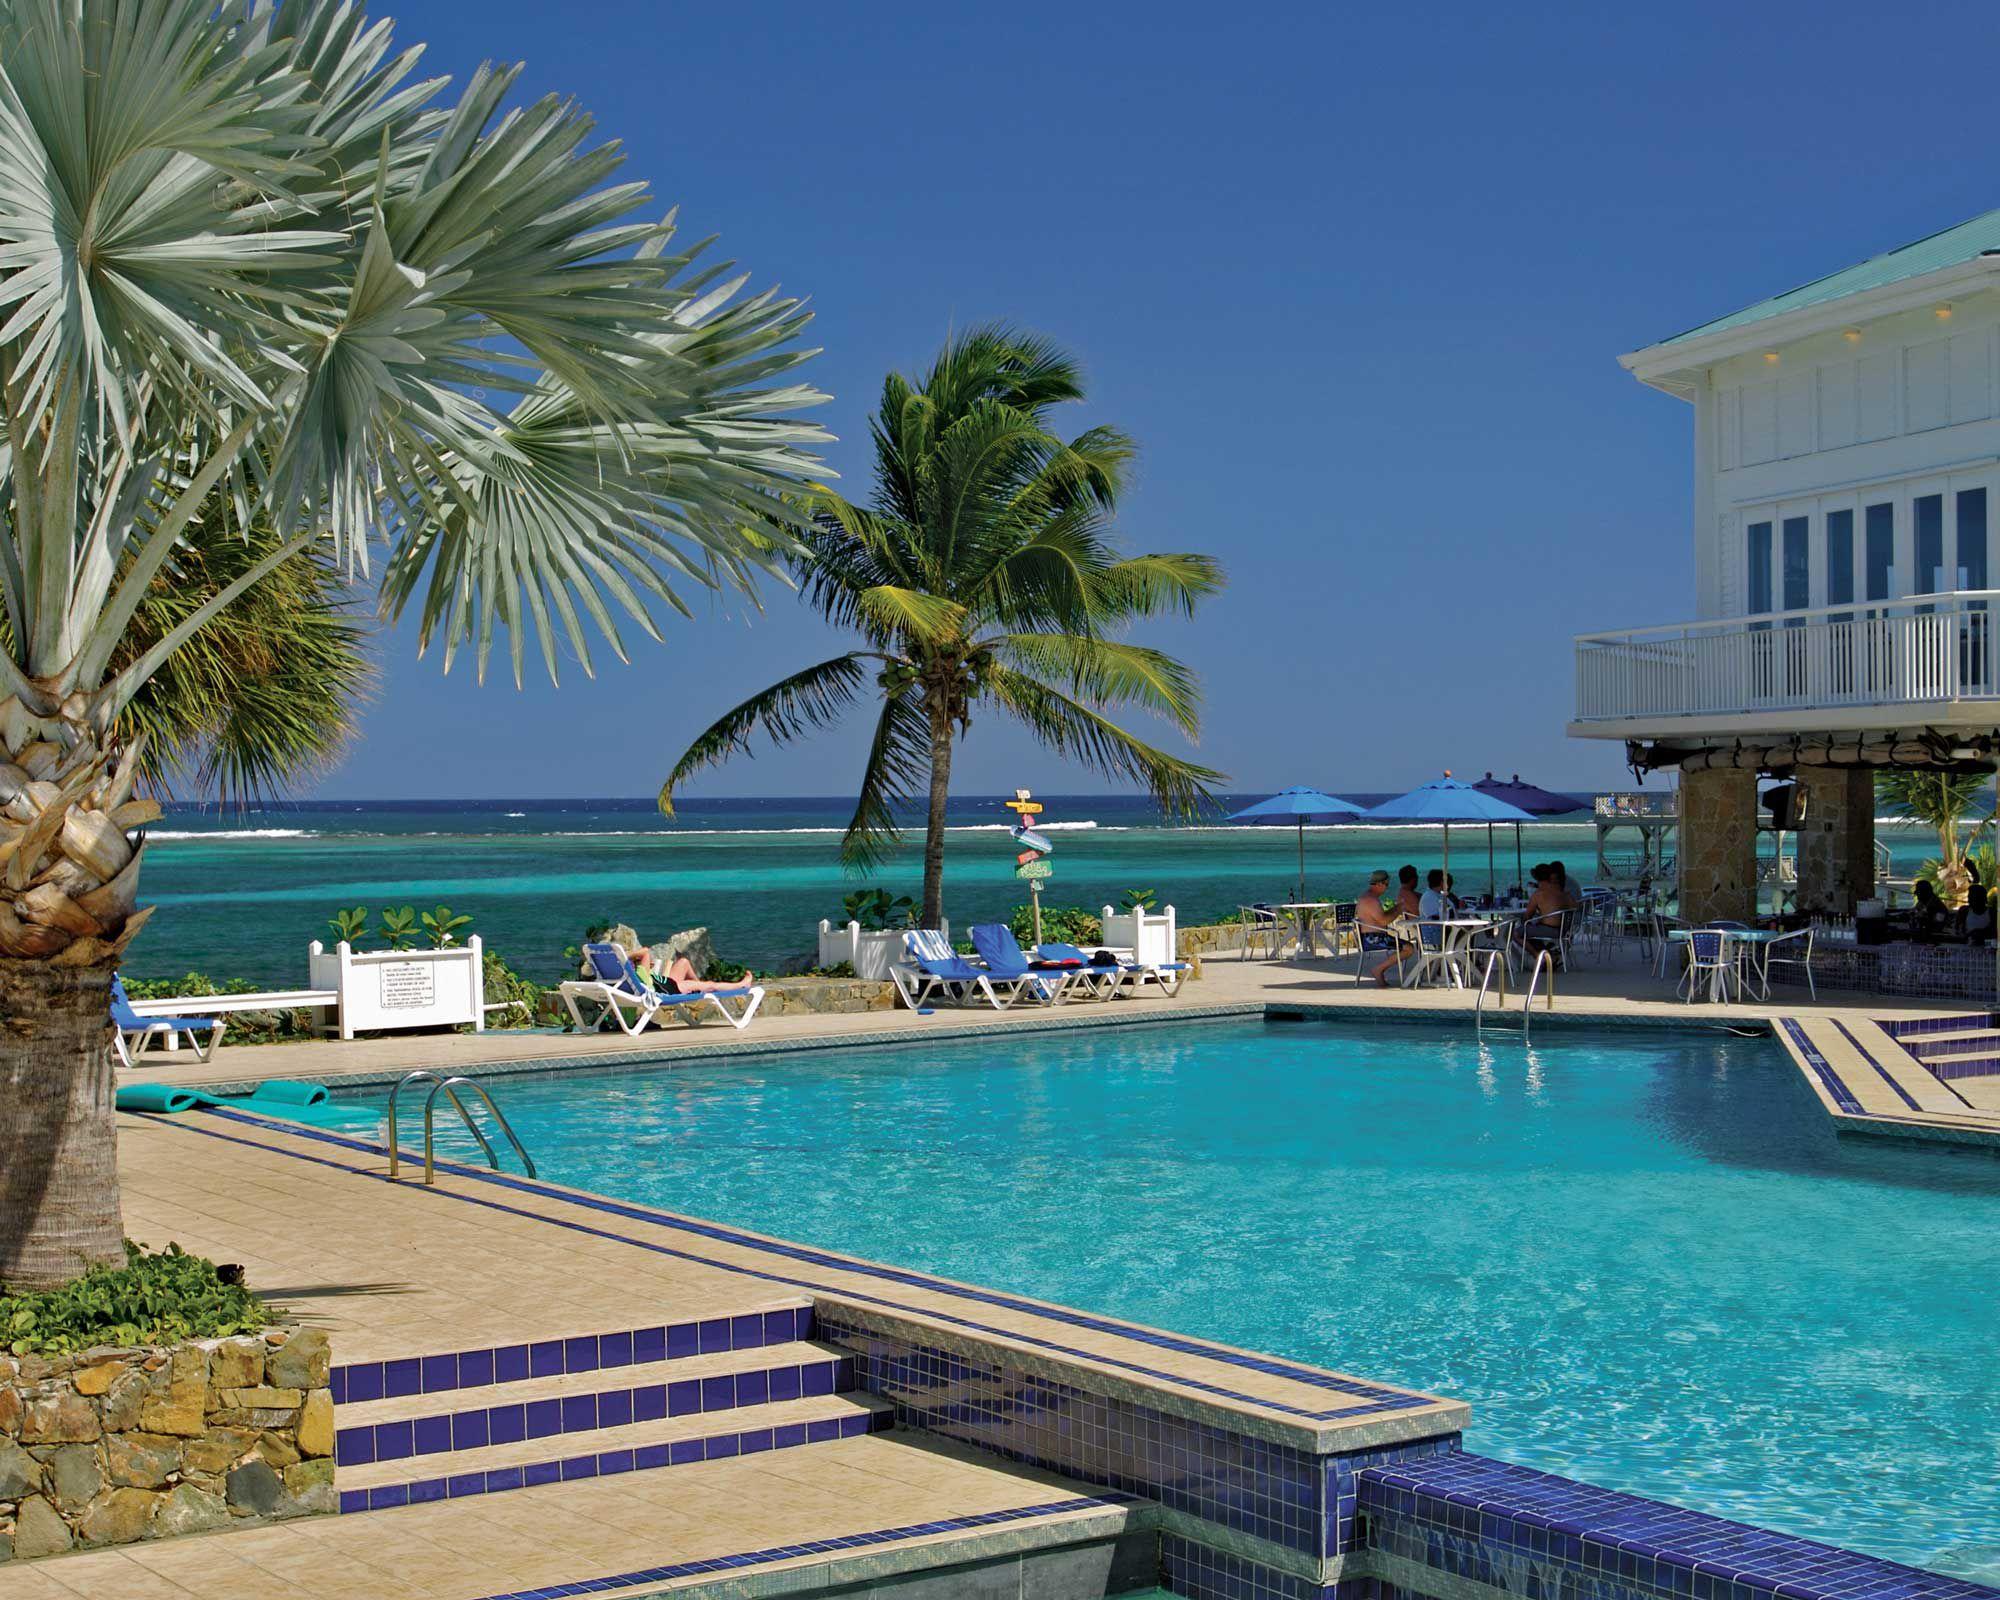 UsaIslands UsaIslands Inclusive Inclusive All Resorts In In Resorts All TK1cJlF